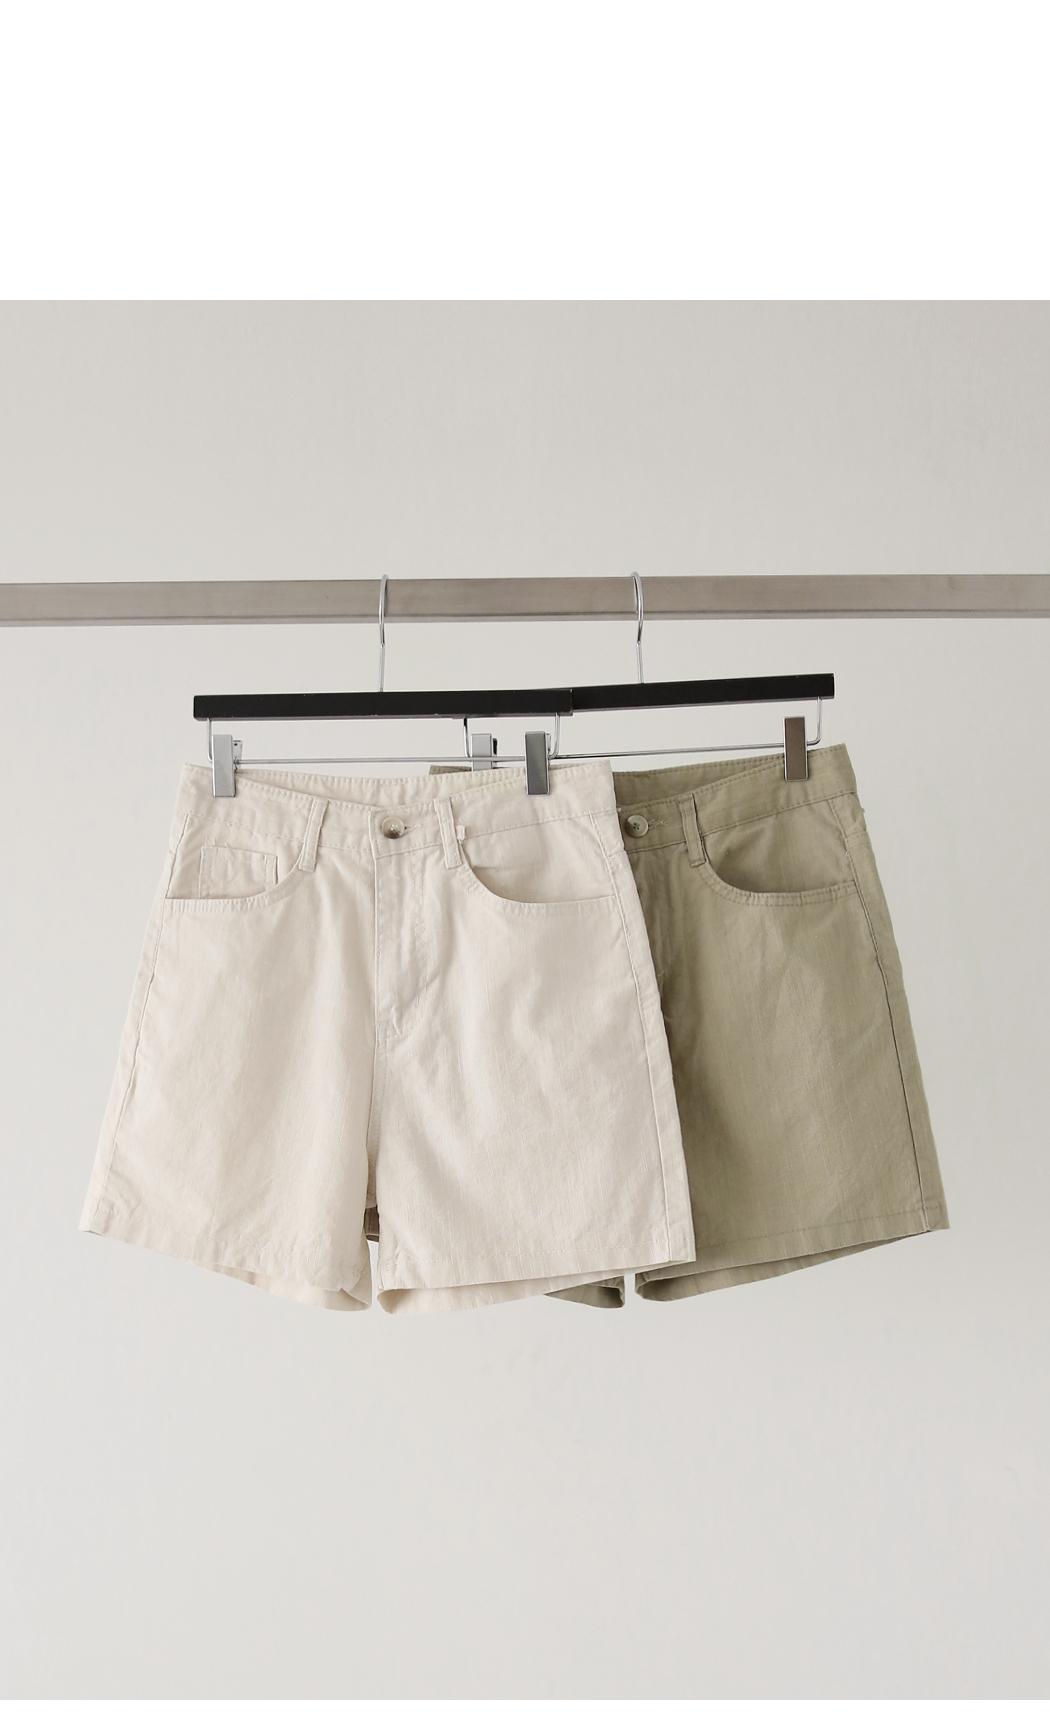 Linen-like cotton shorts